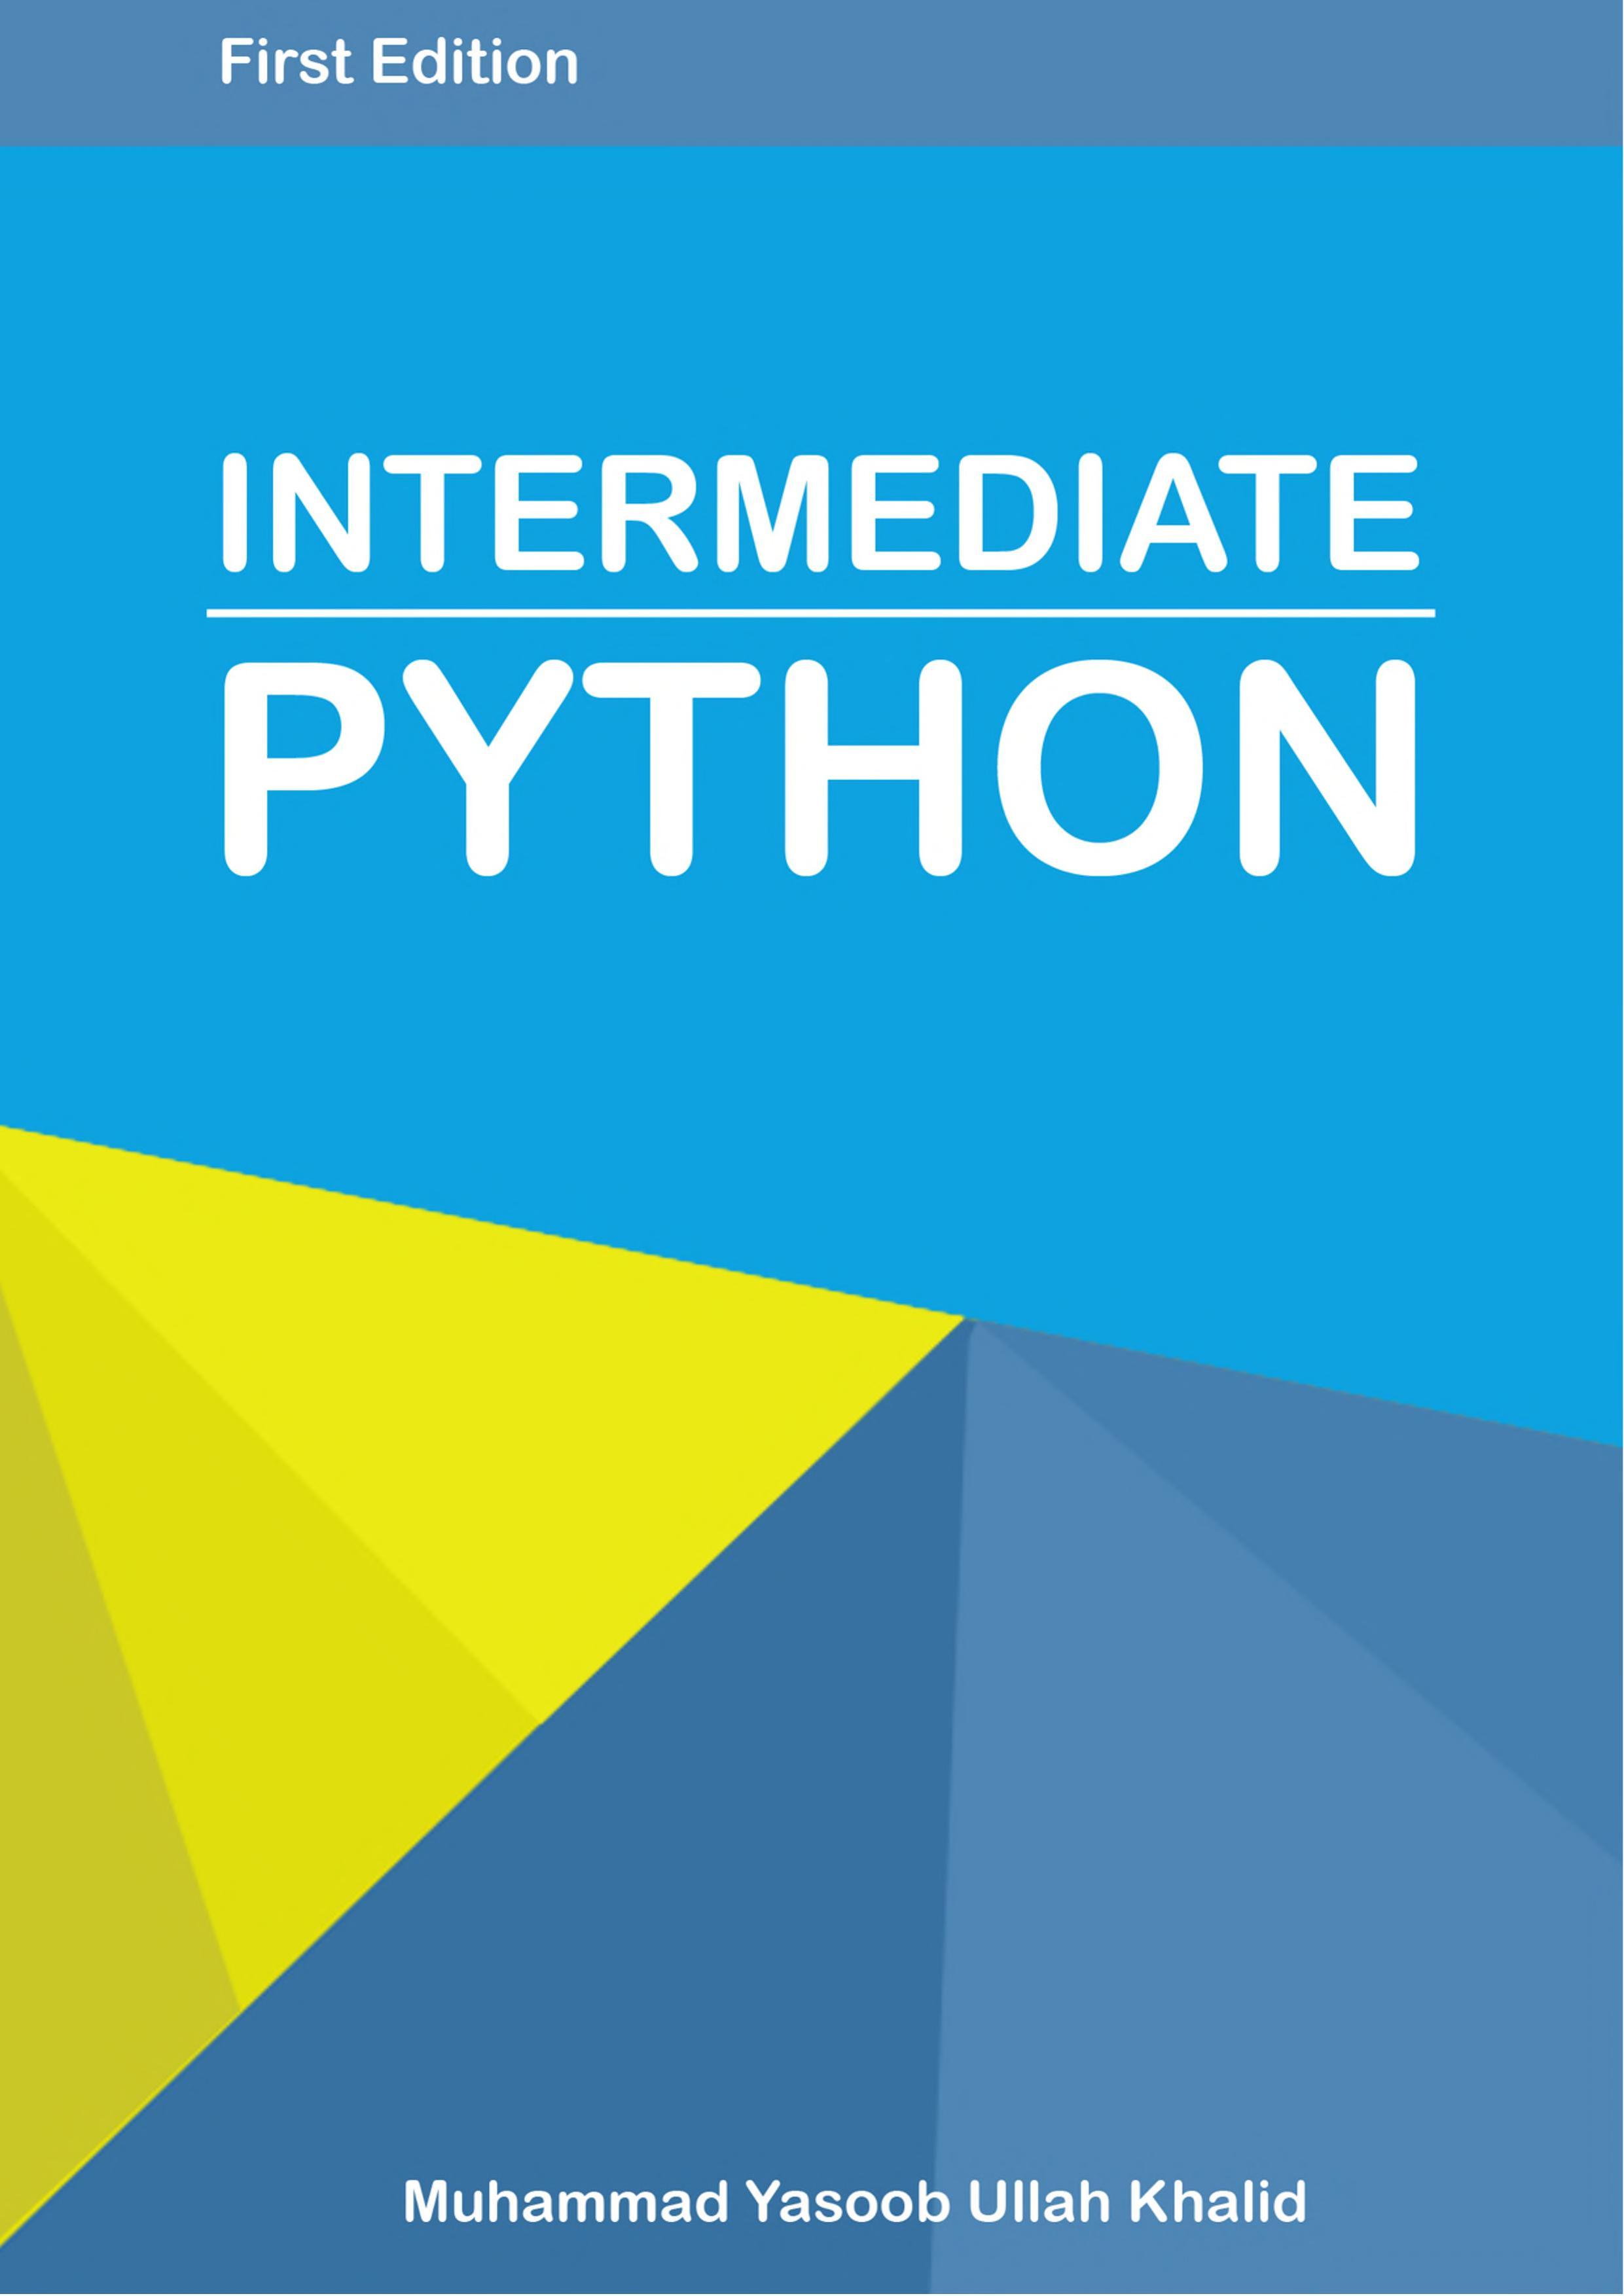 Intermediate Python by Muhammad Yasoob Ullah Khalid